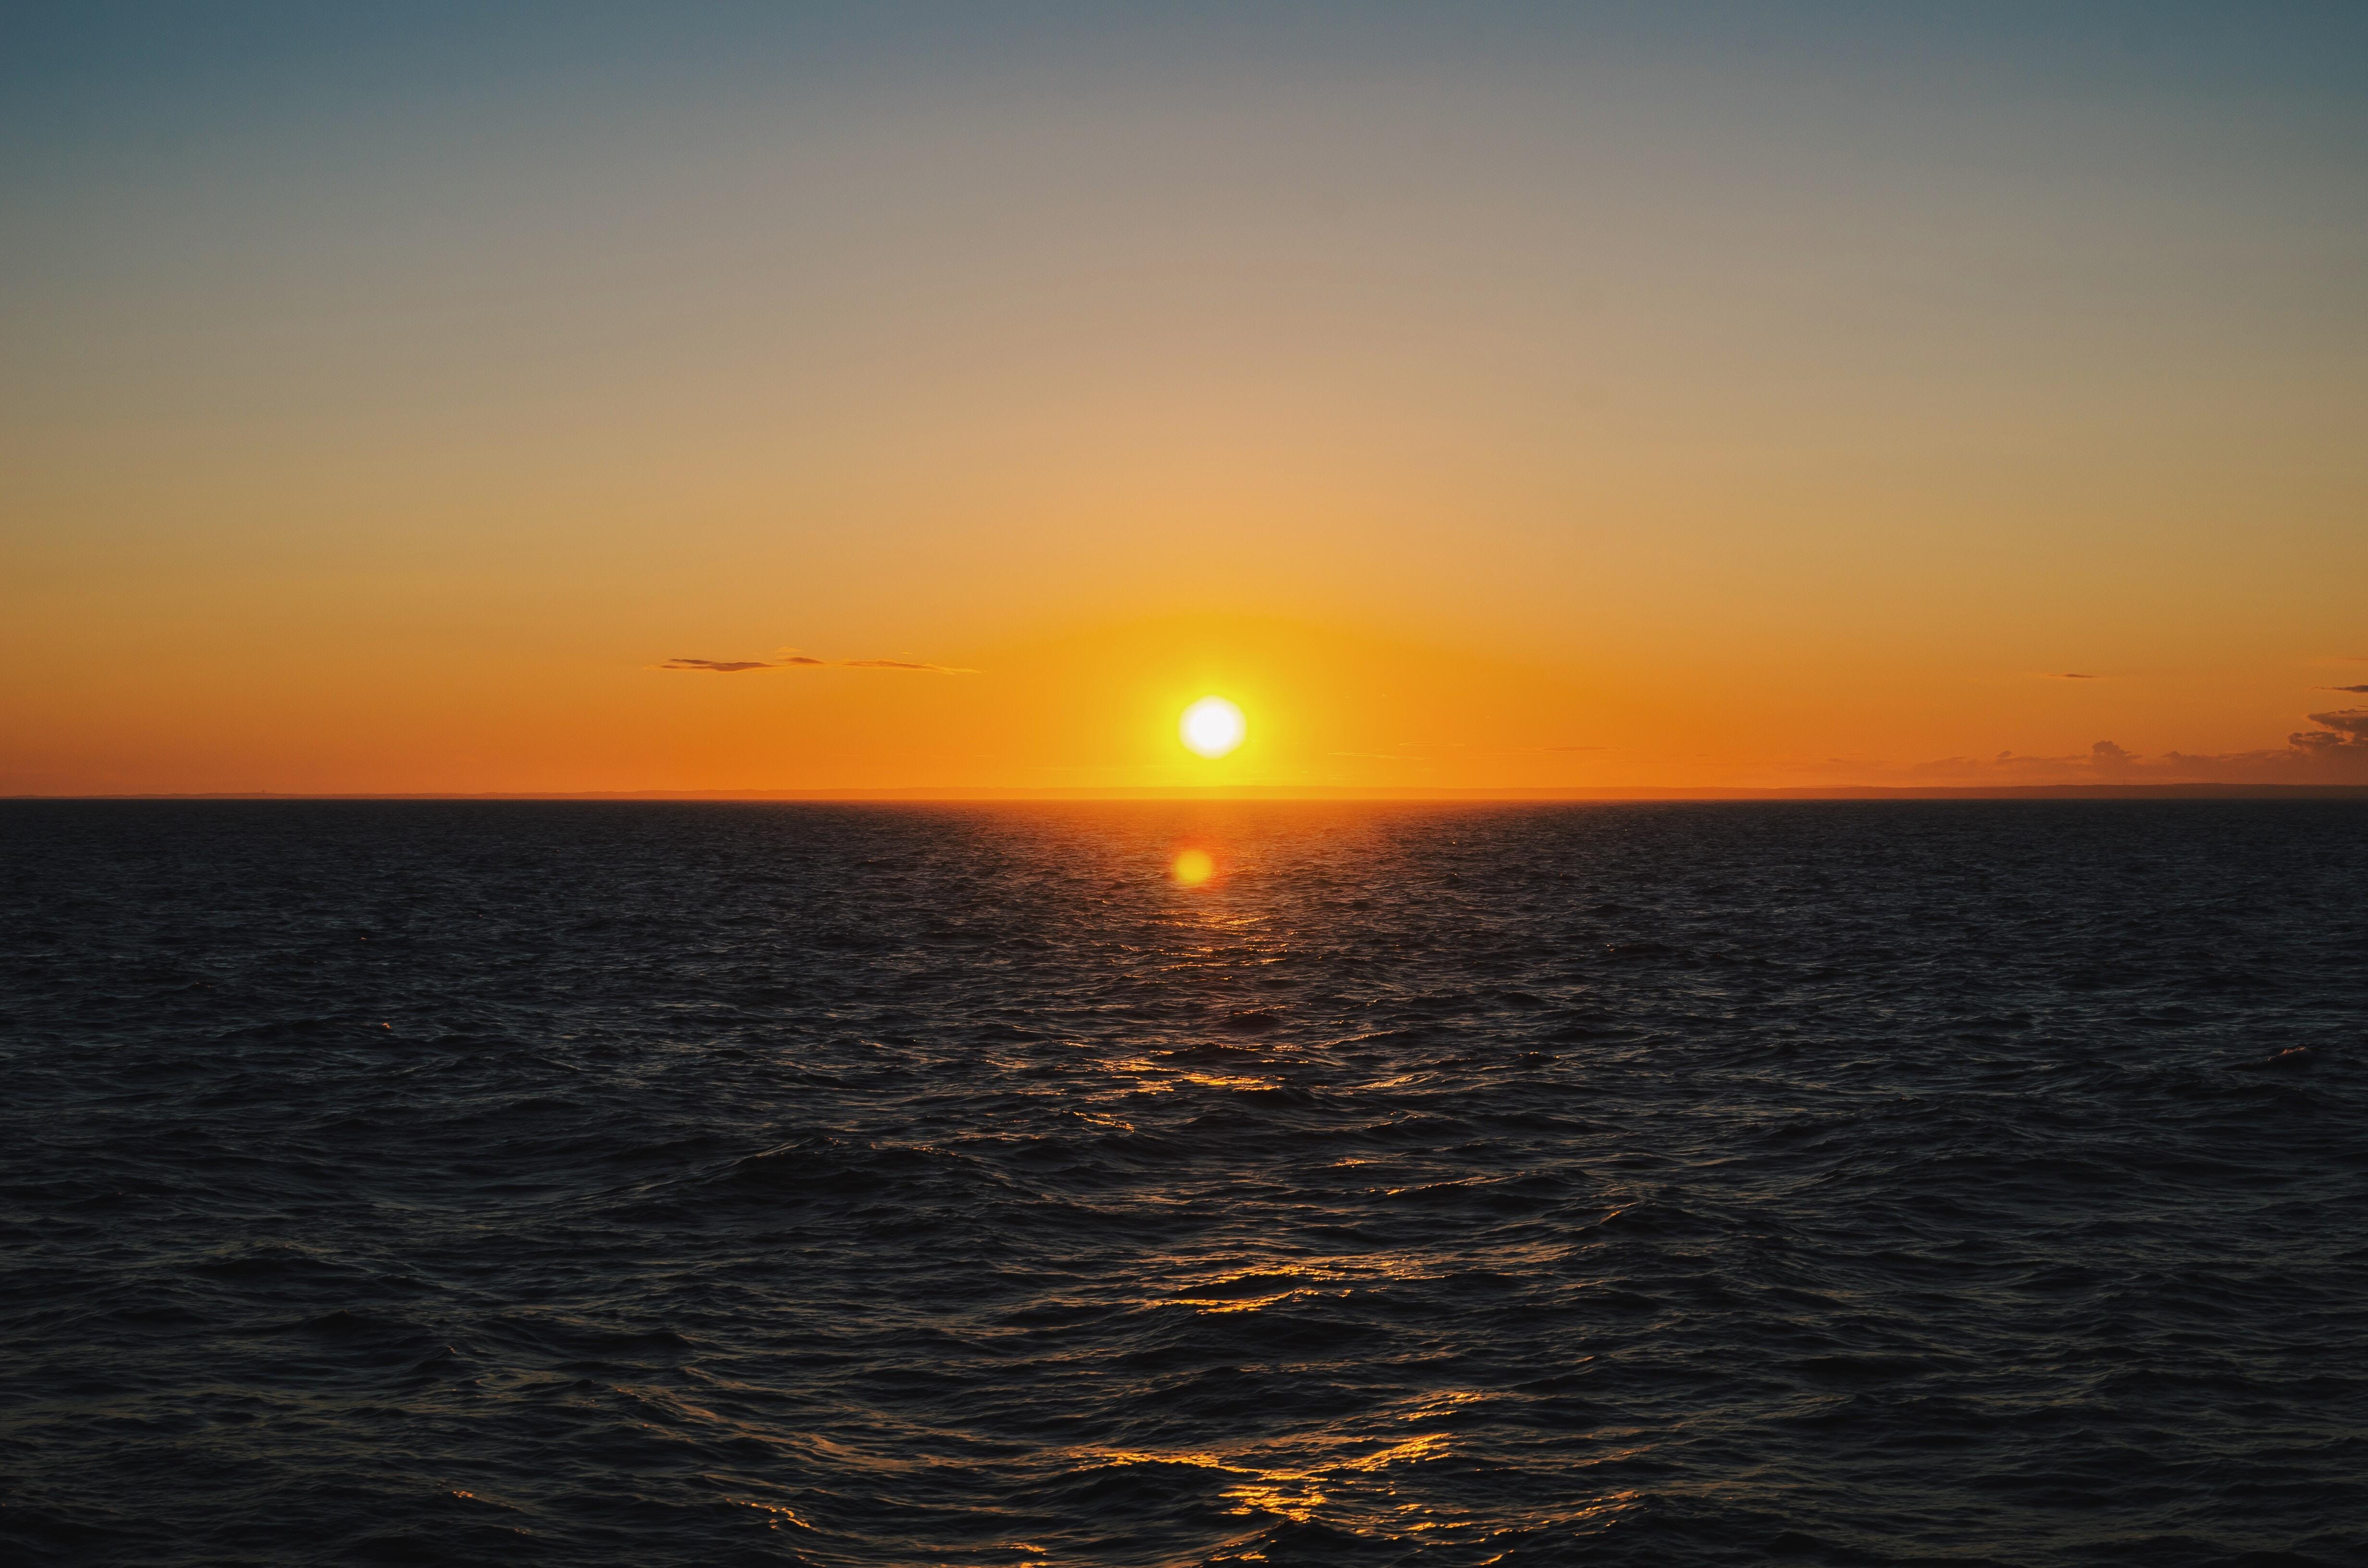 A dark orange sunset over ocean waves at New Shoreham.